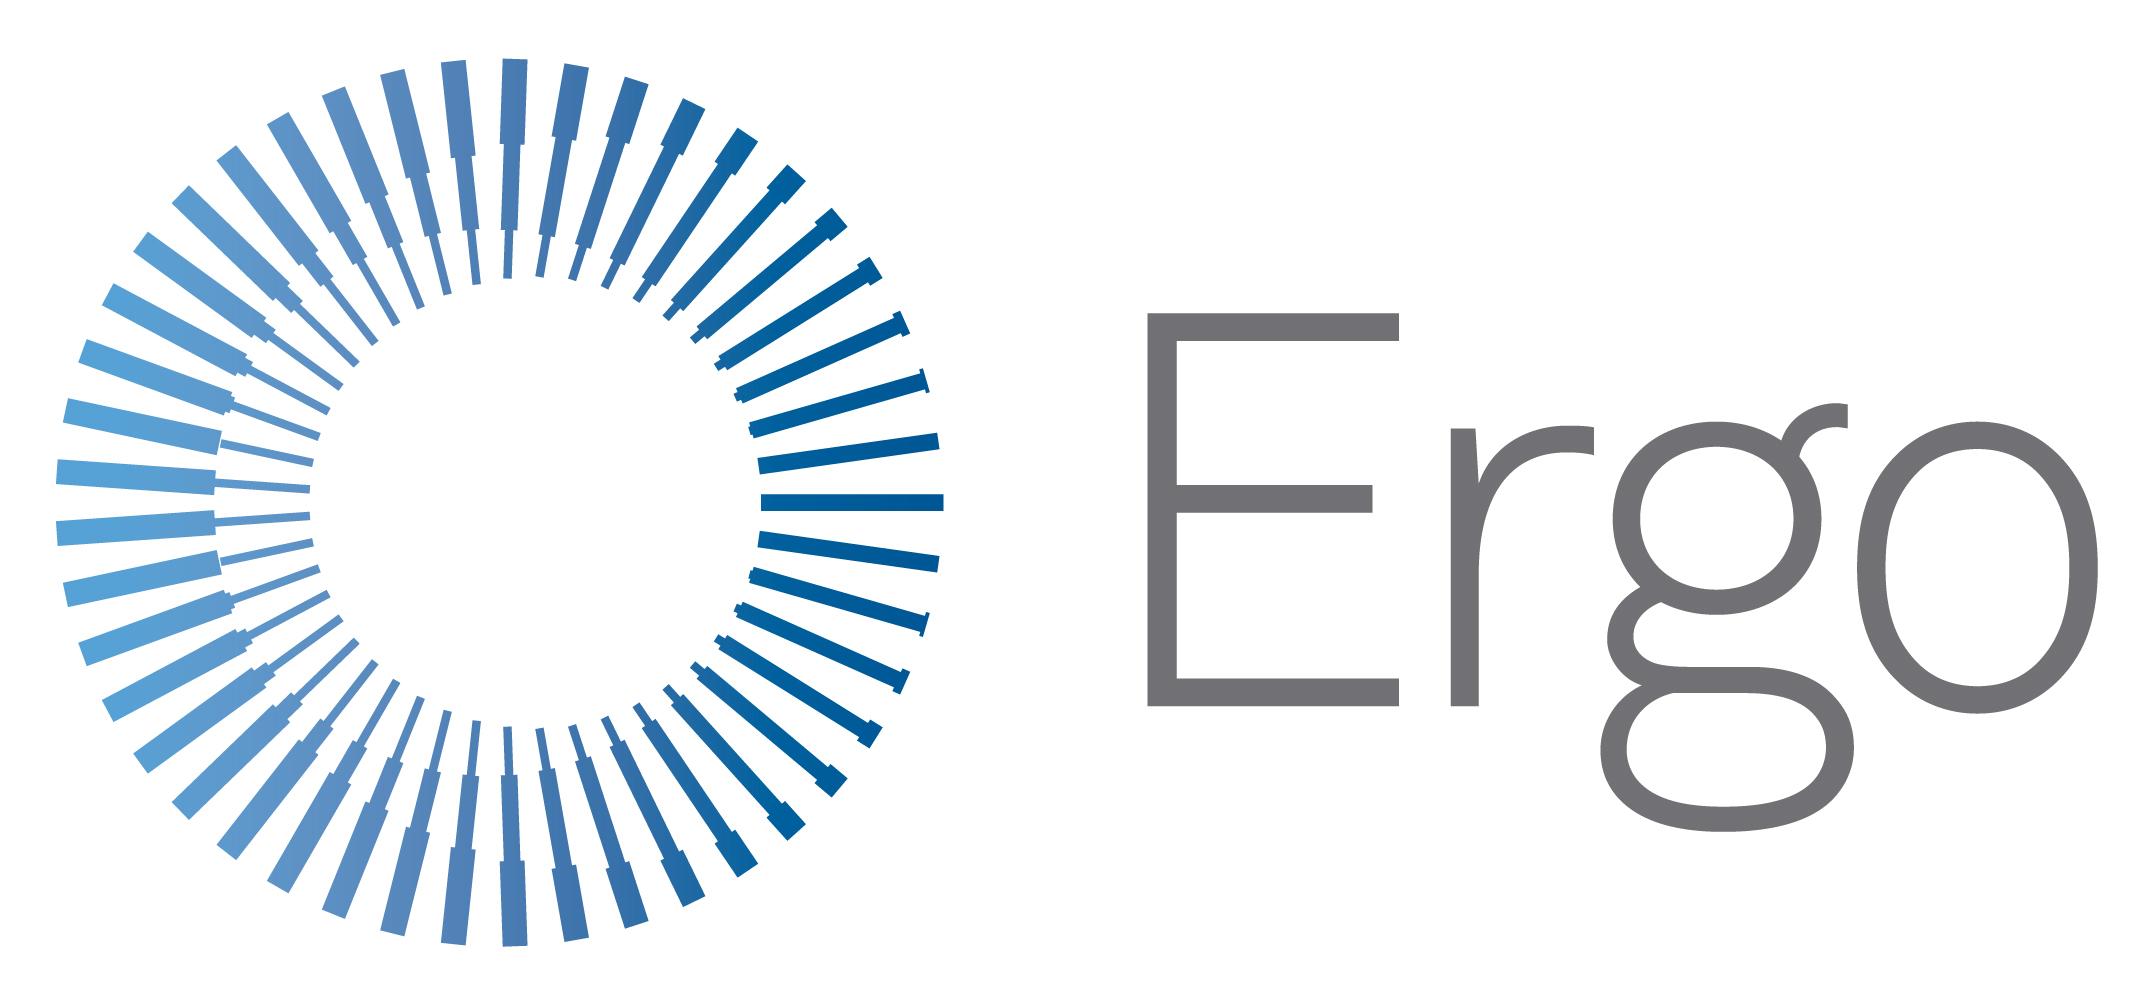 Ergo_Logo_(1)_(1).jpg